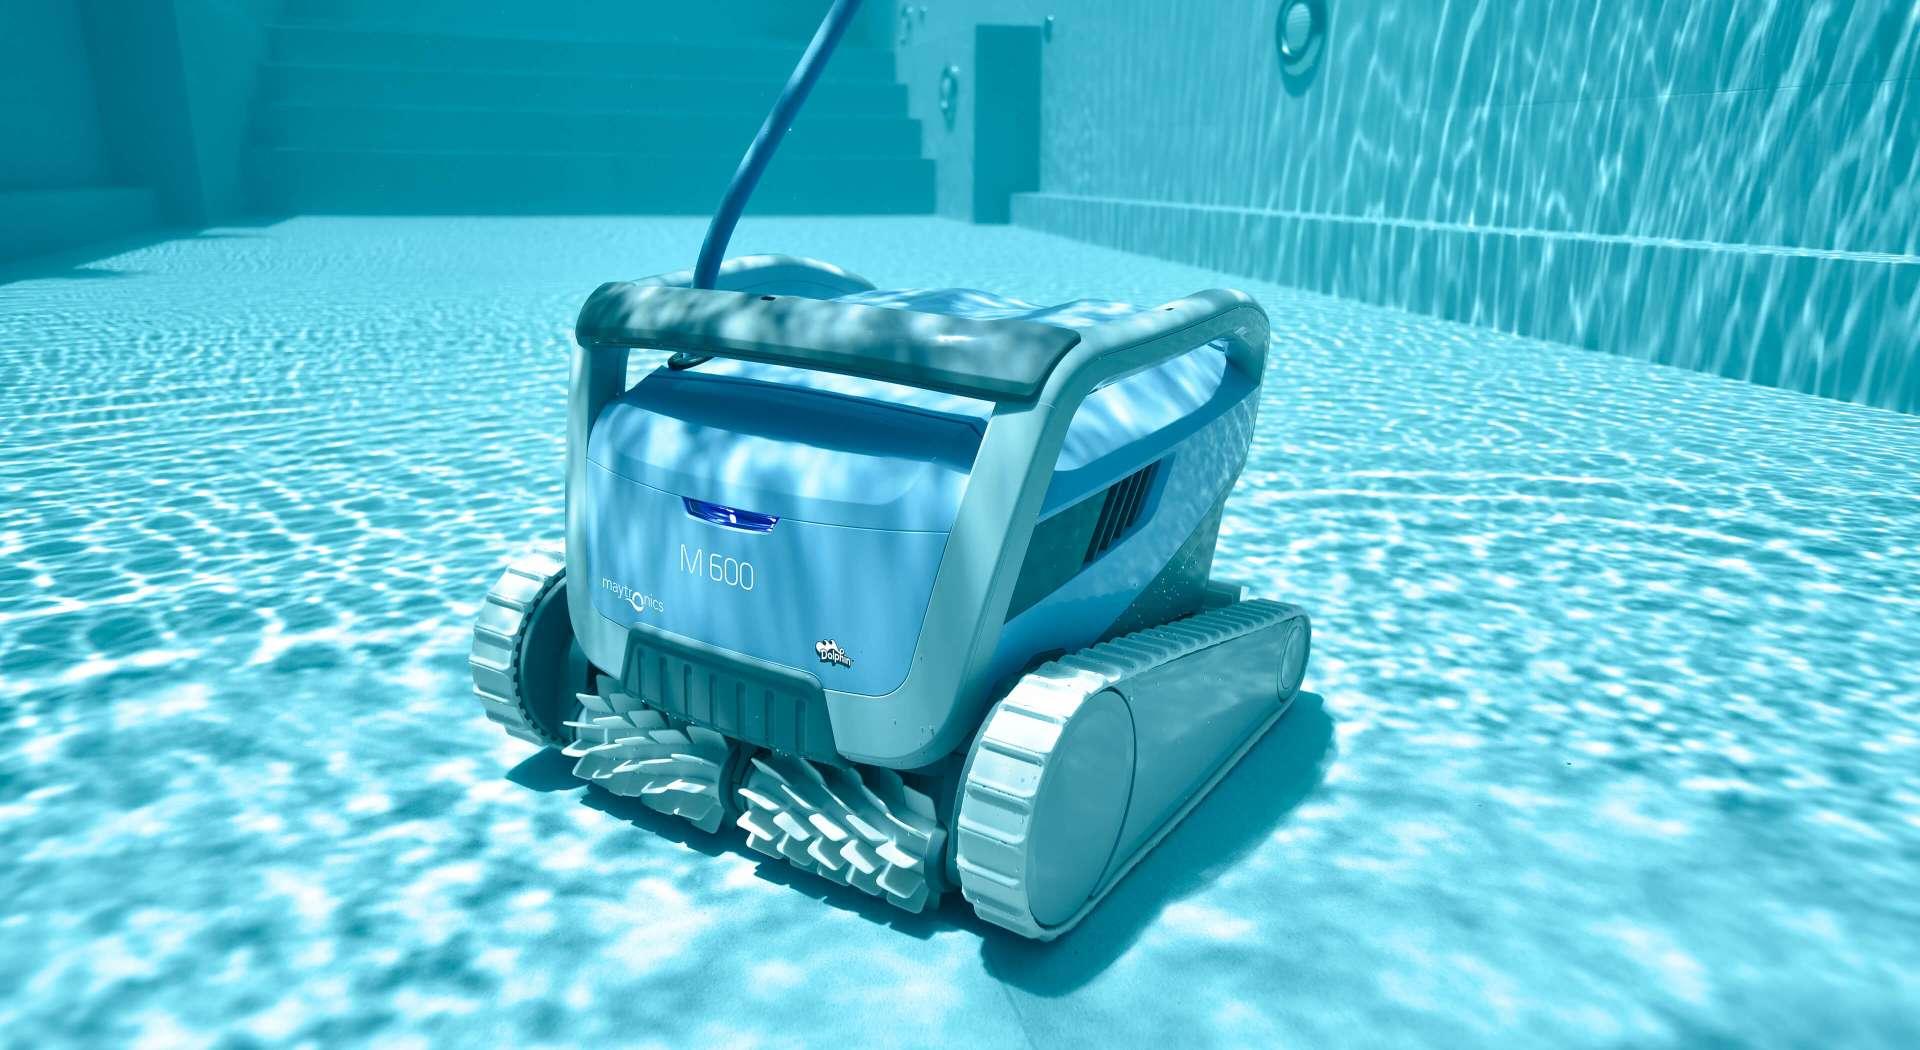 Robot vacuum pool cleaner